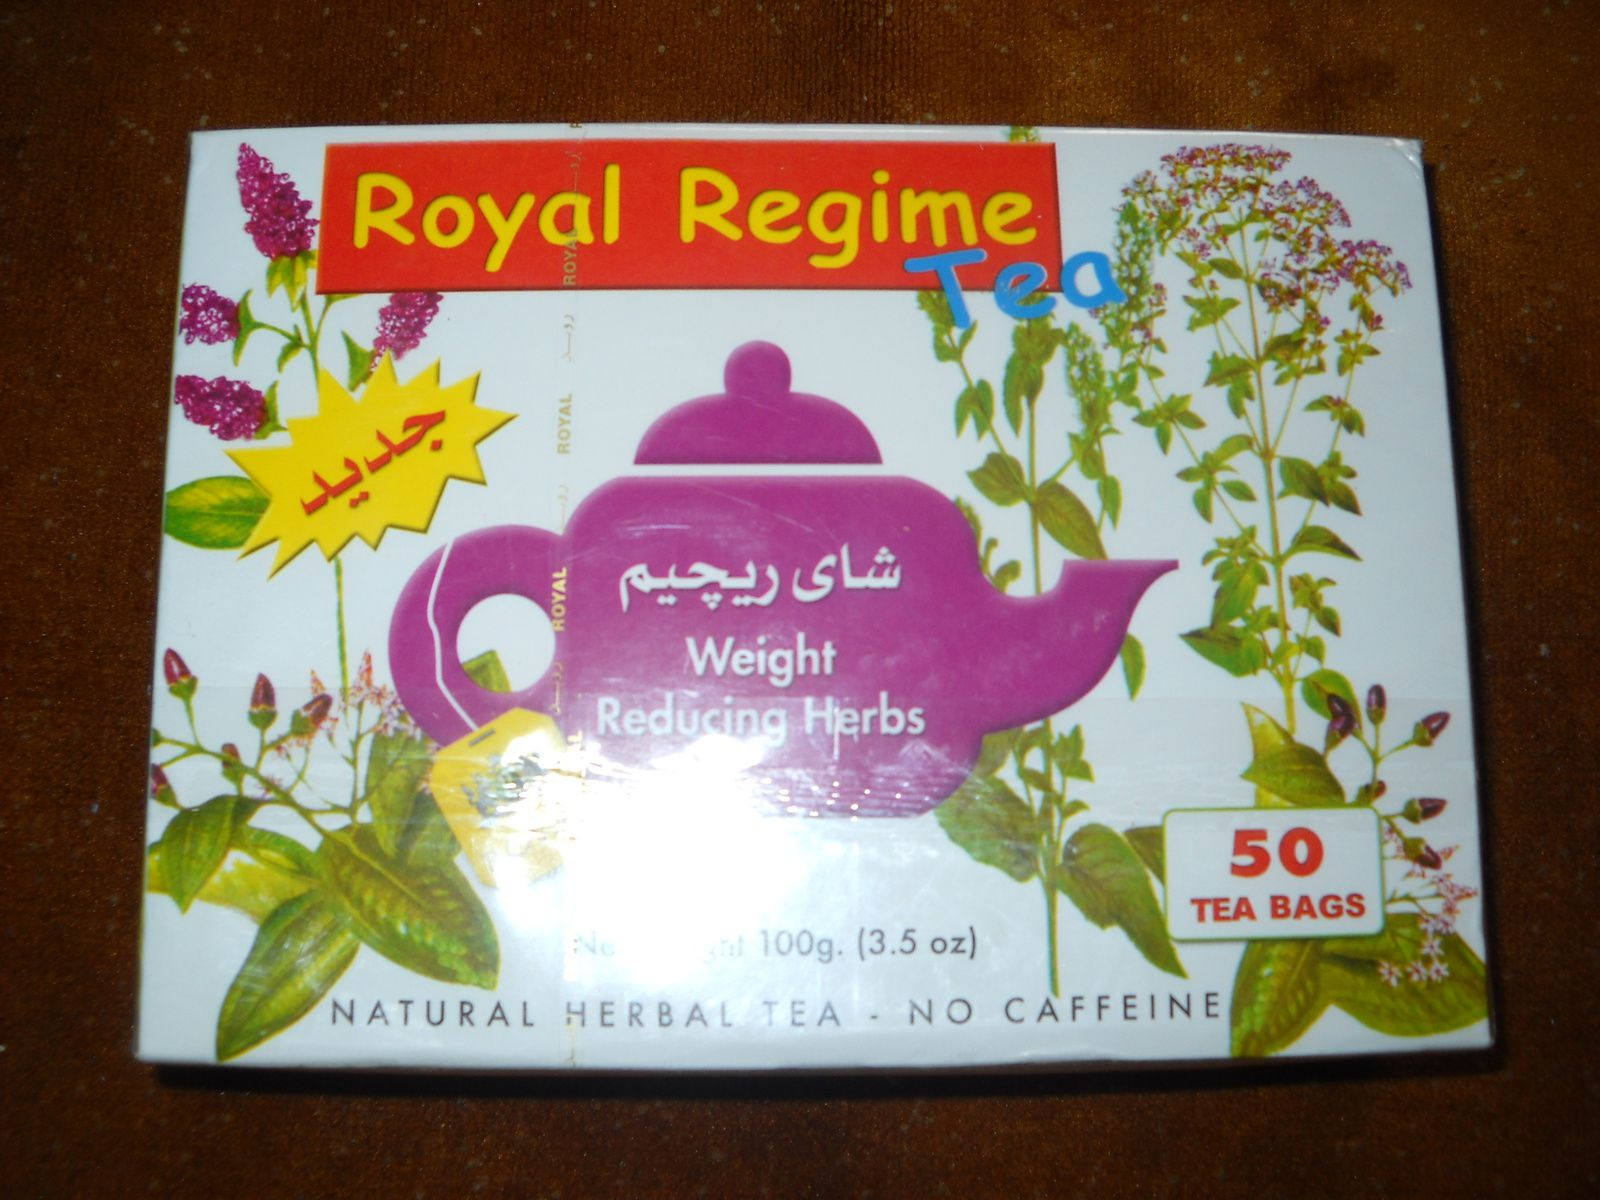 Thé royal regime 50 sachets